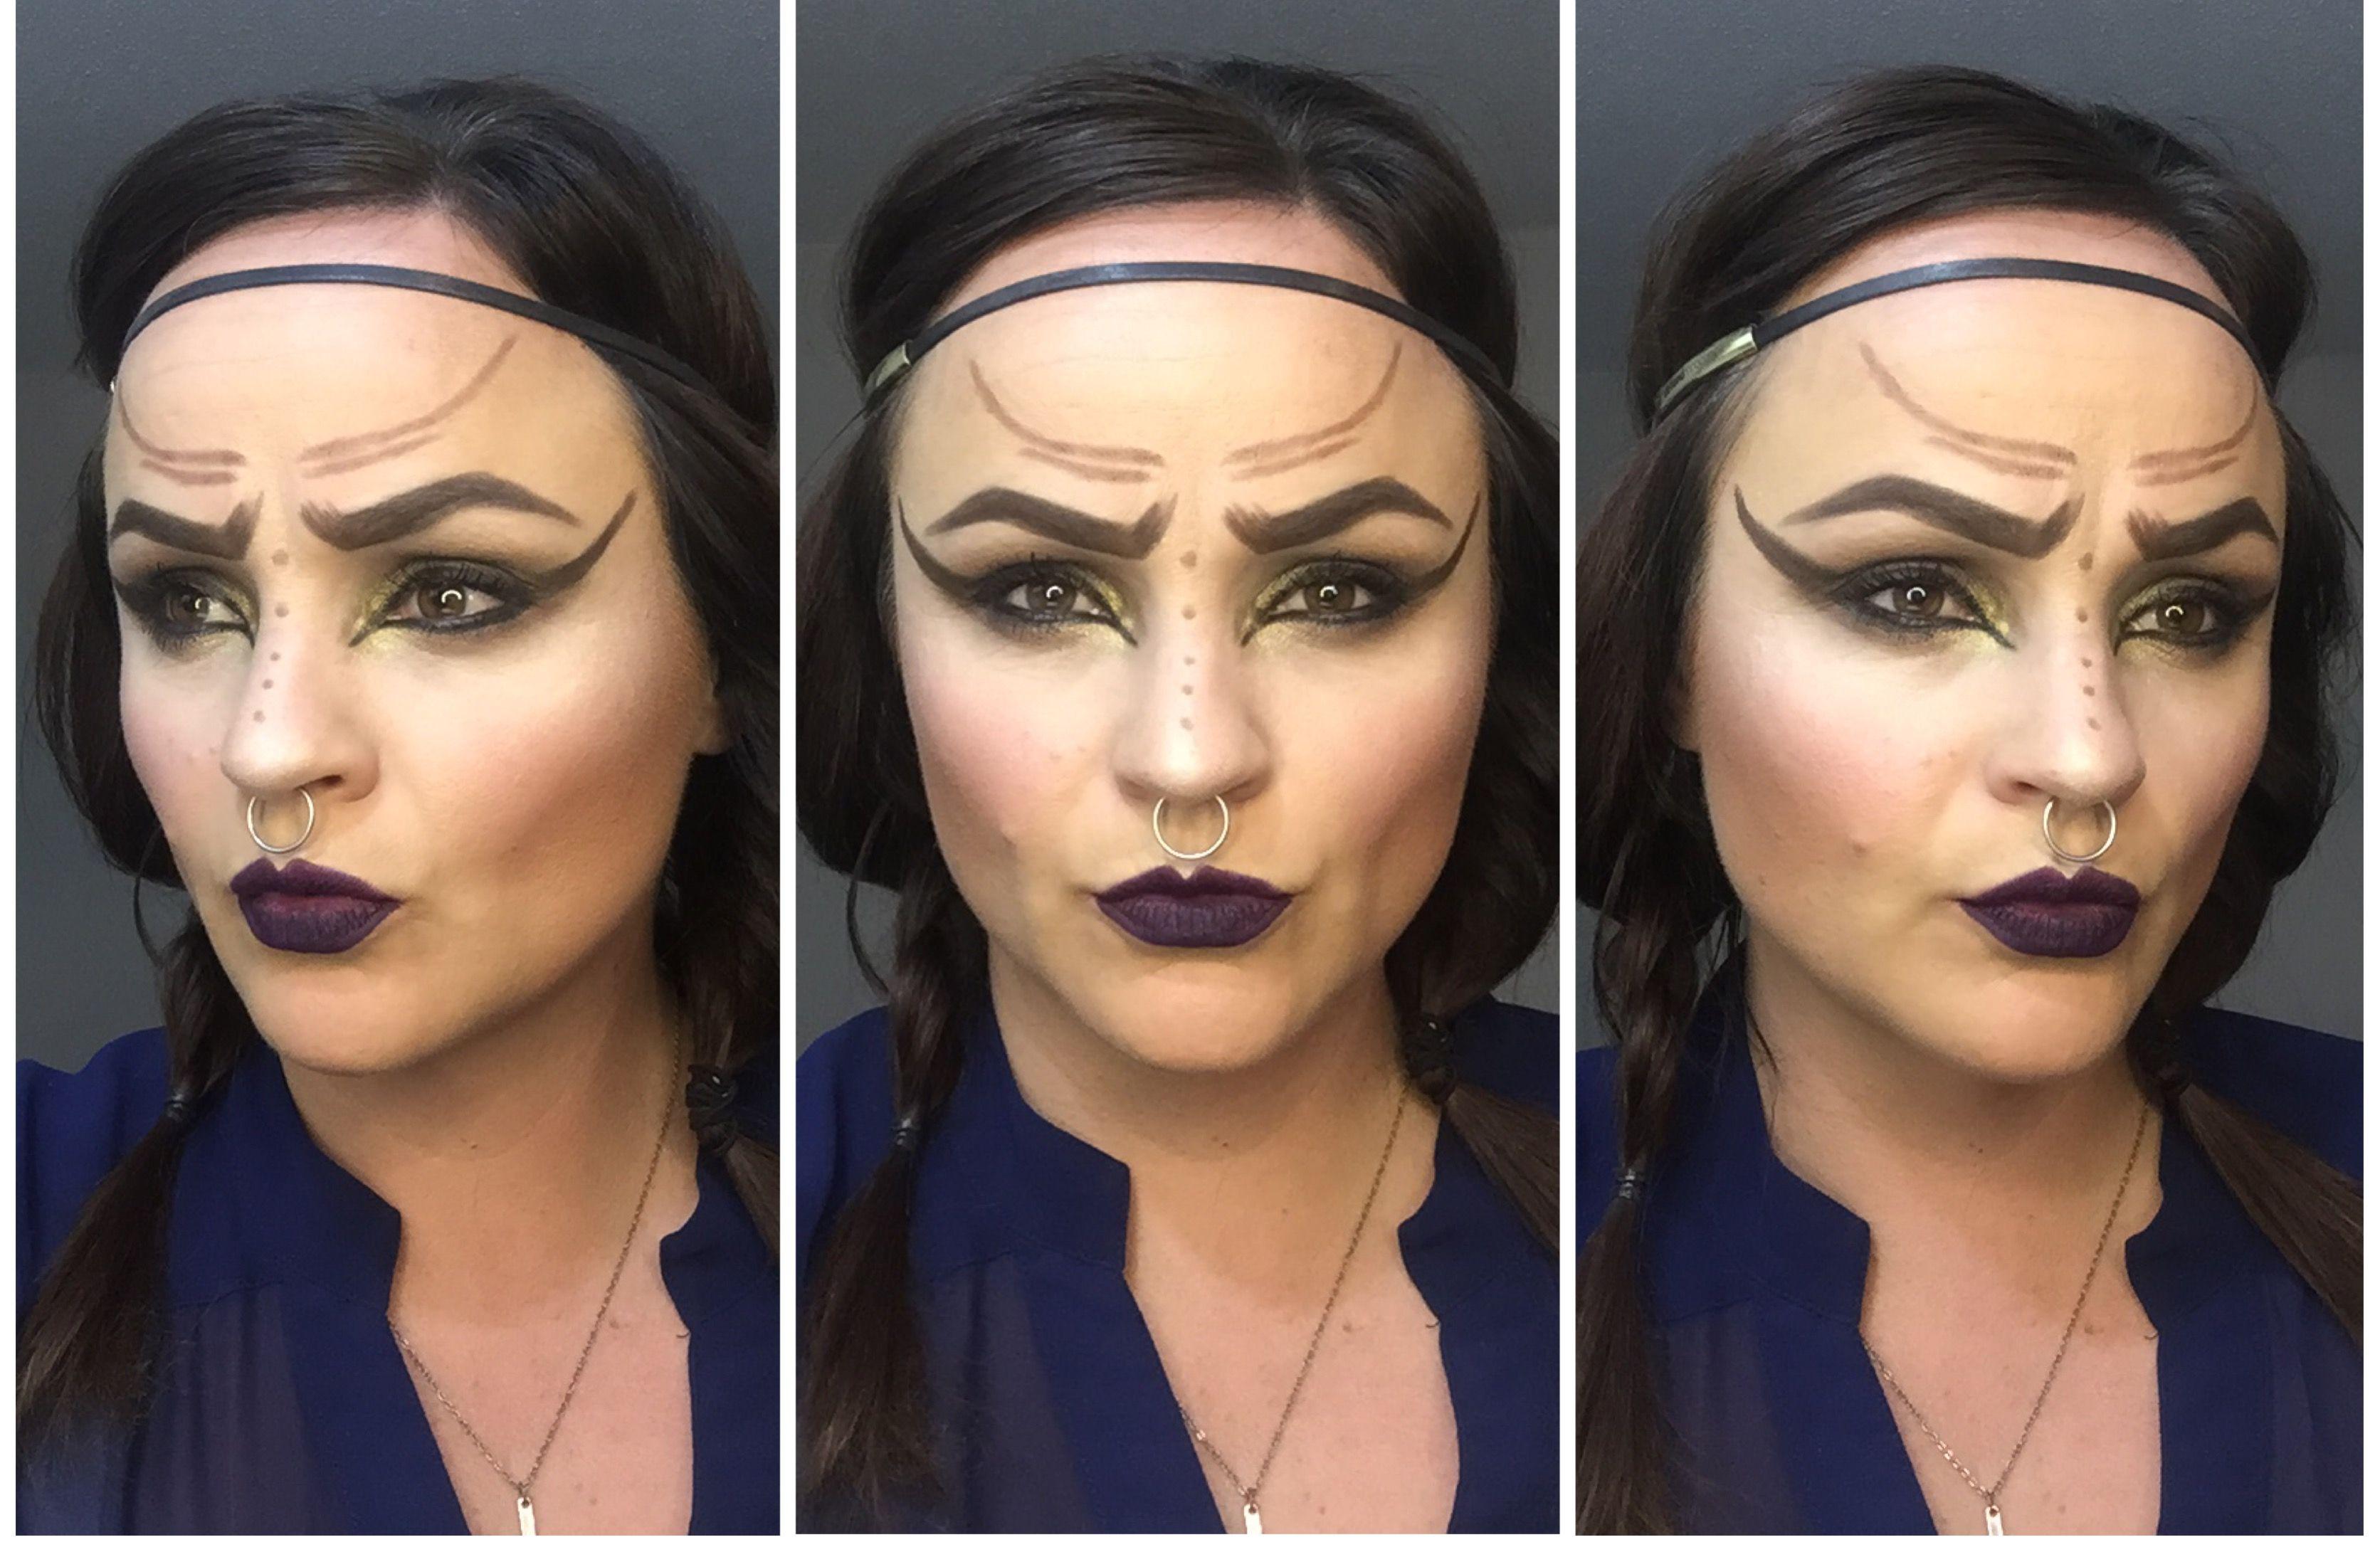 Zodiac Sign Makeup Taurus Channelling my inner Taurus